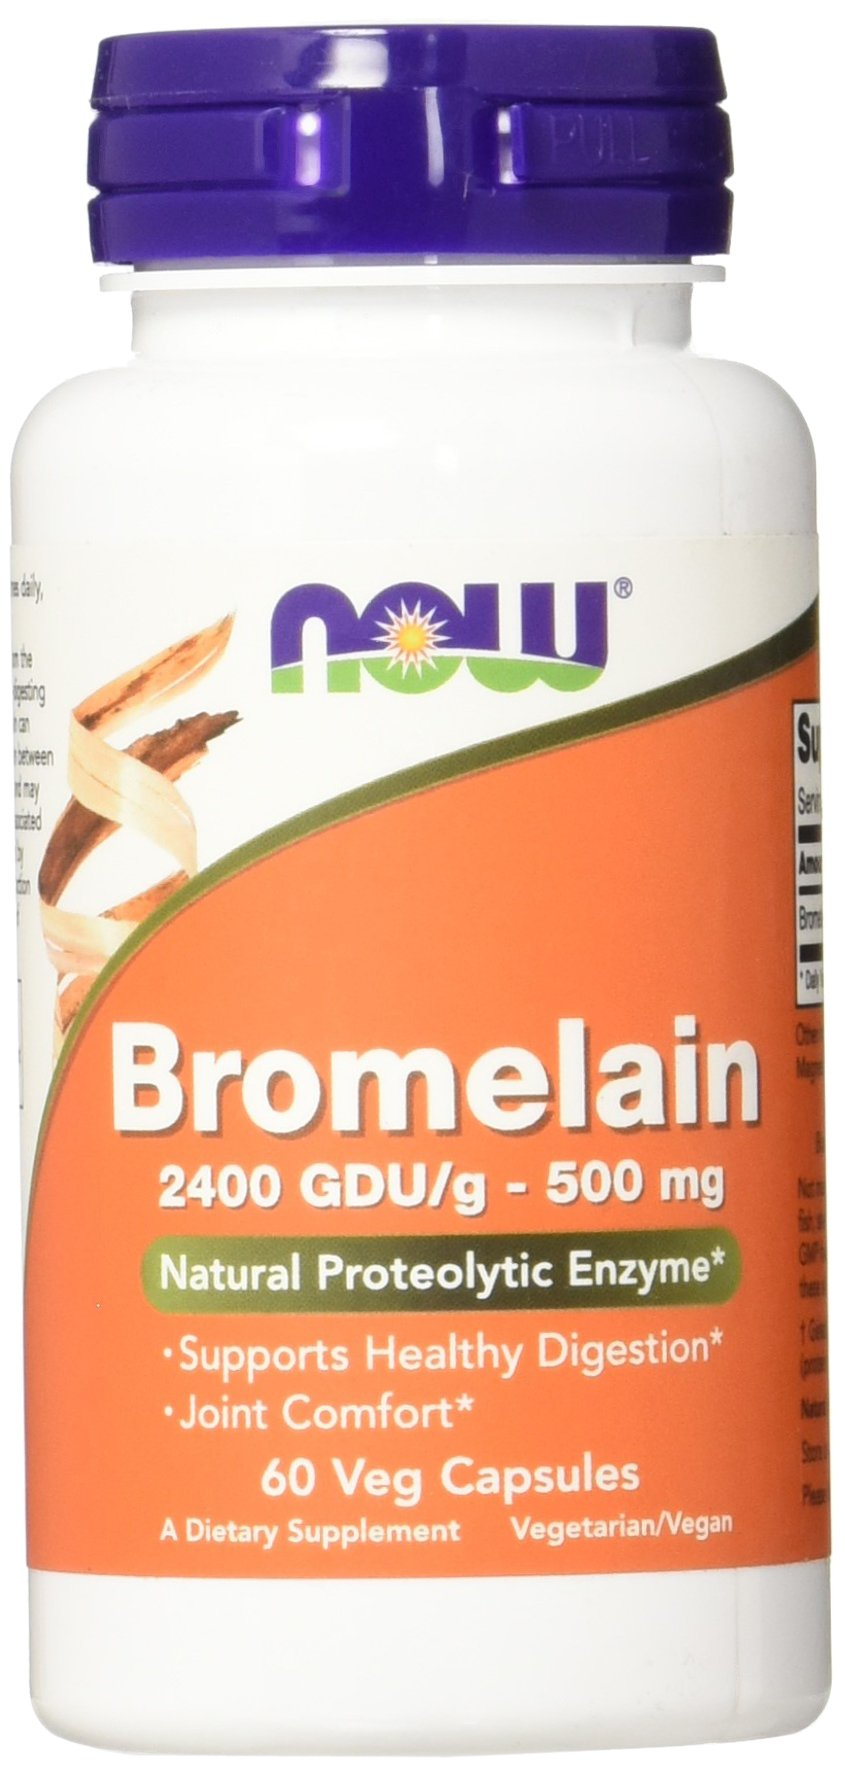 NOW Bromelain 2400 GDU, 500mg, 60 Veg Capsules